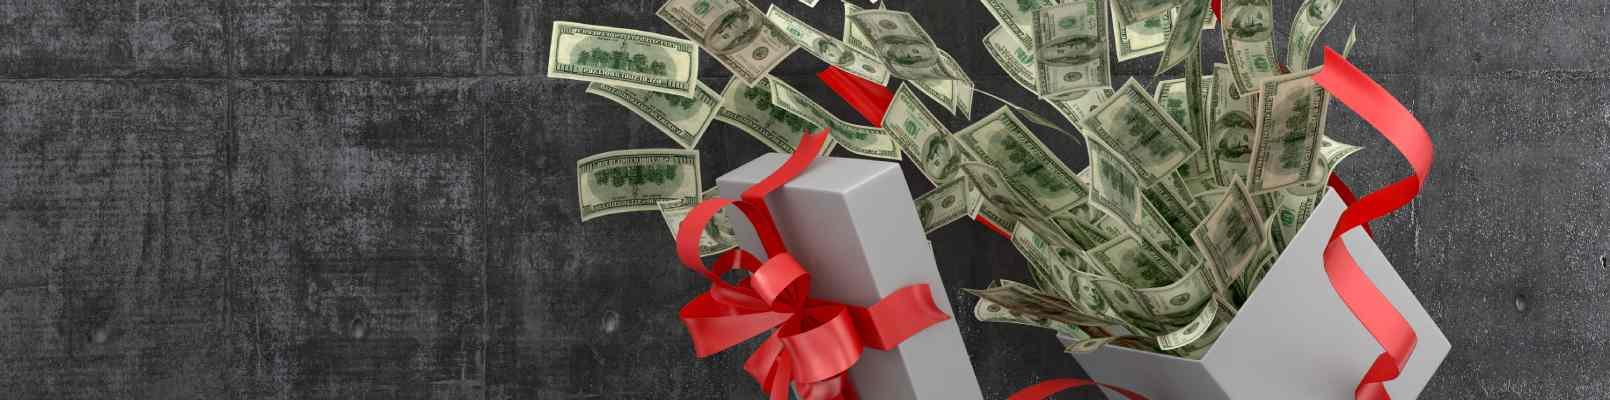 premii baumbet cash